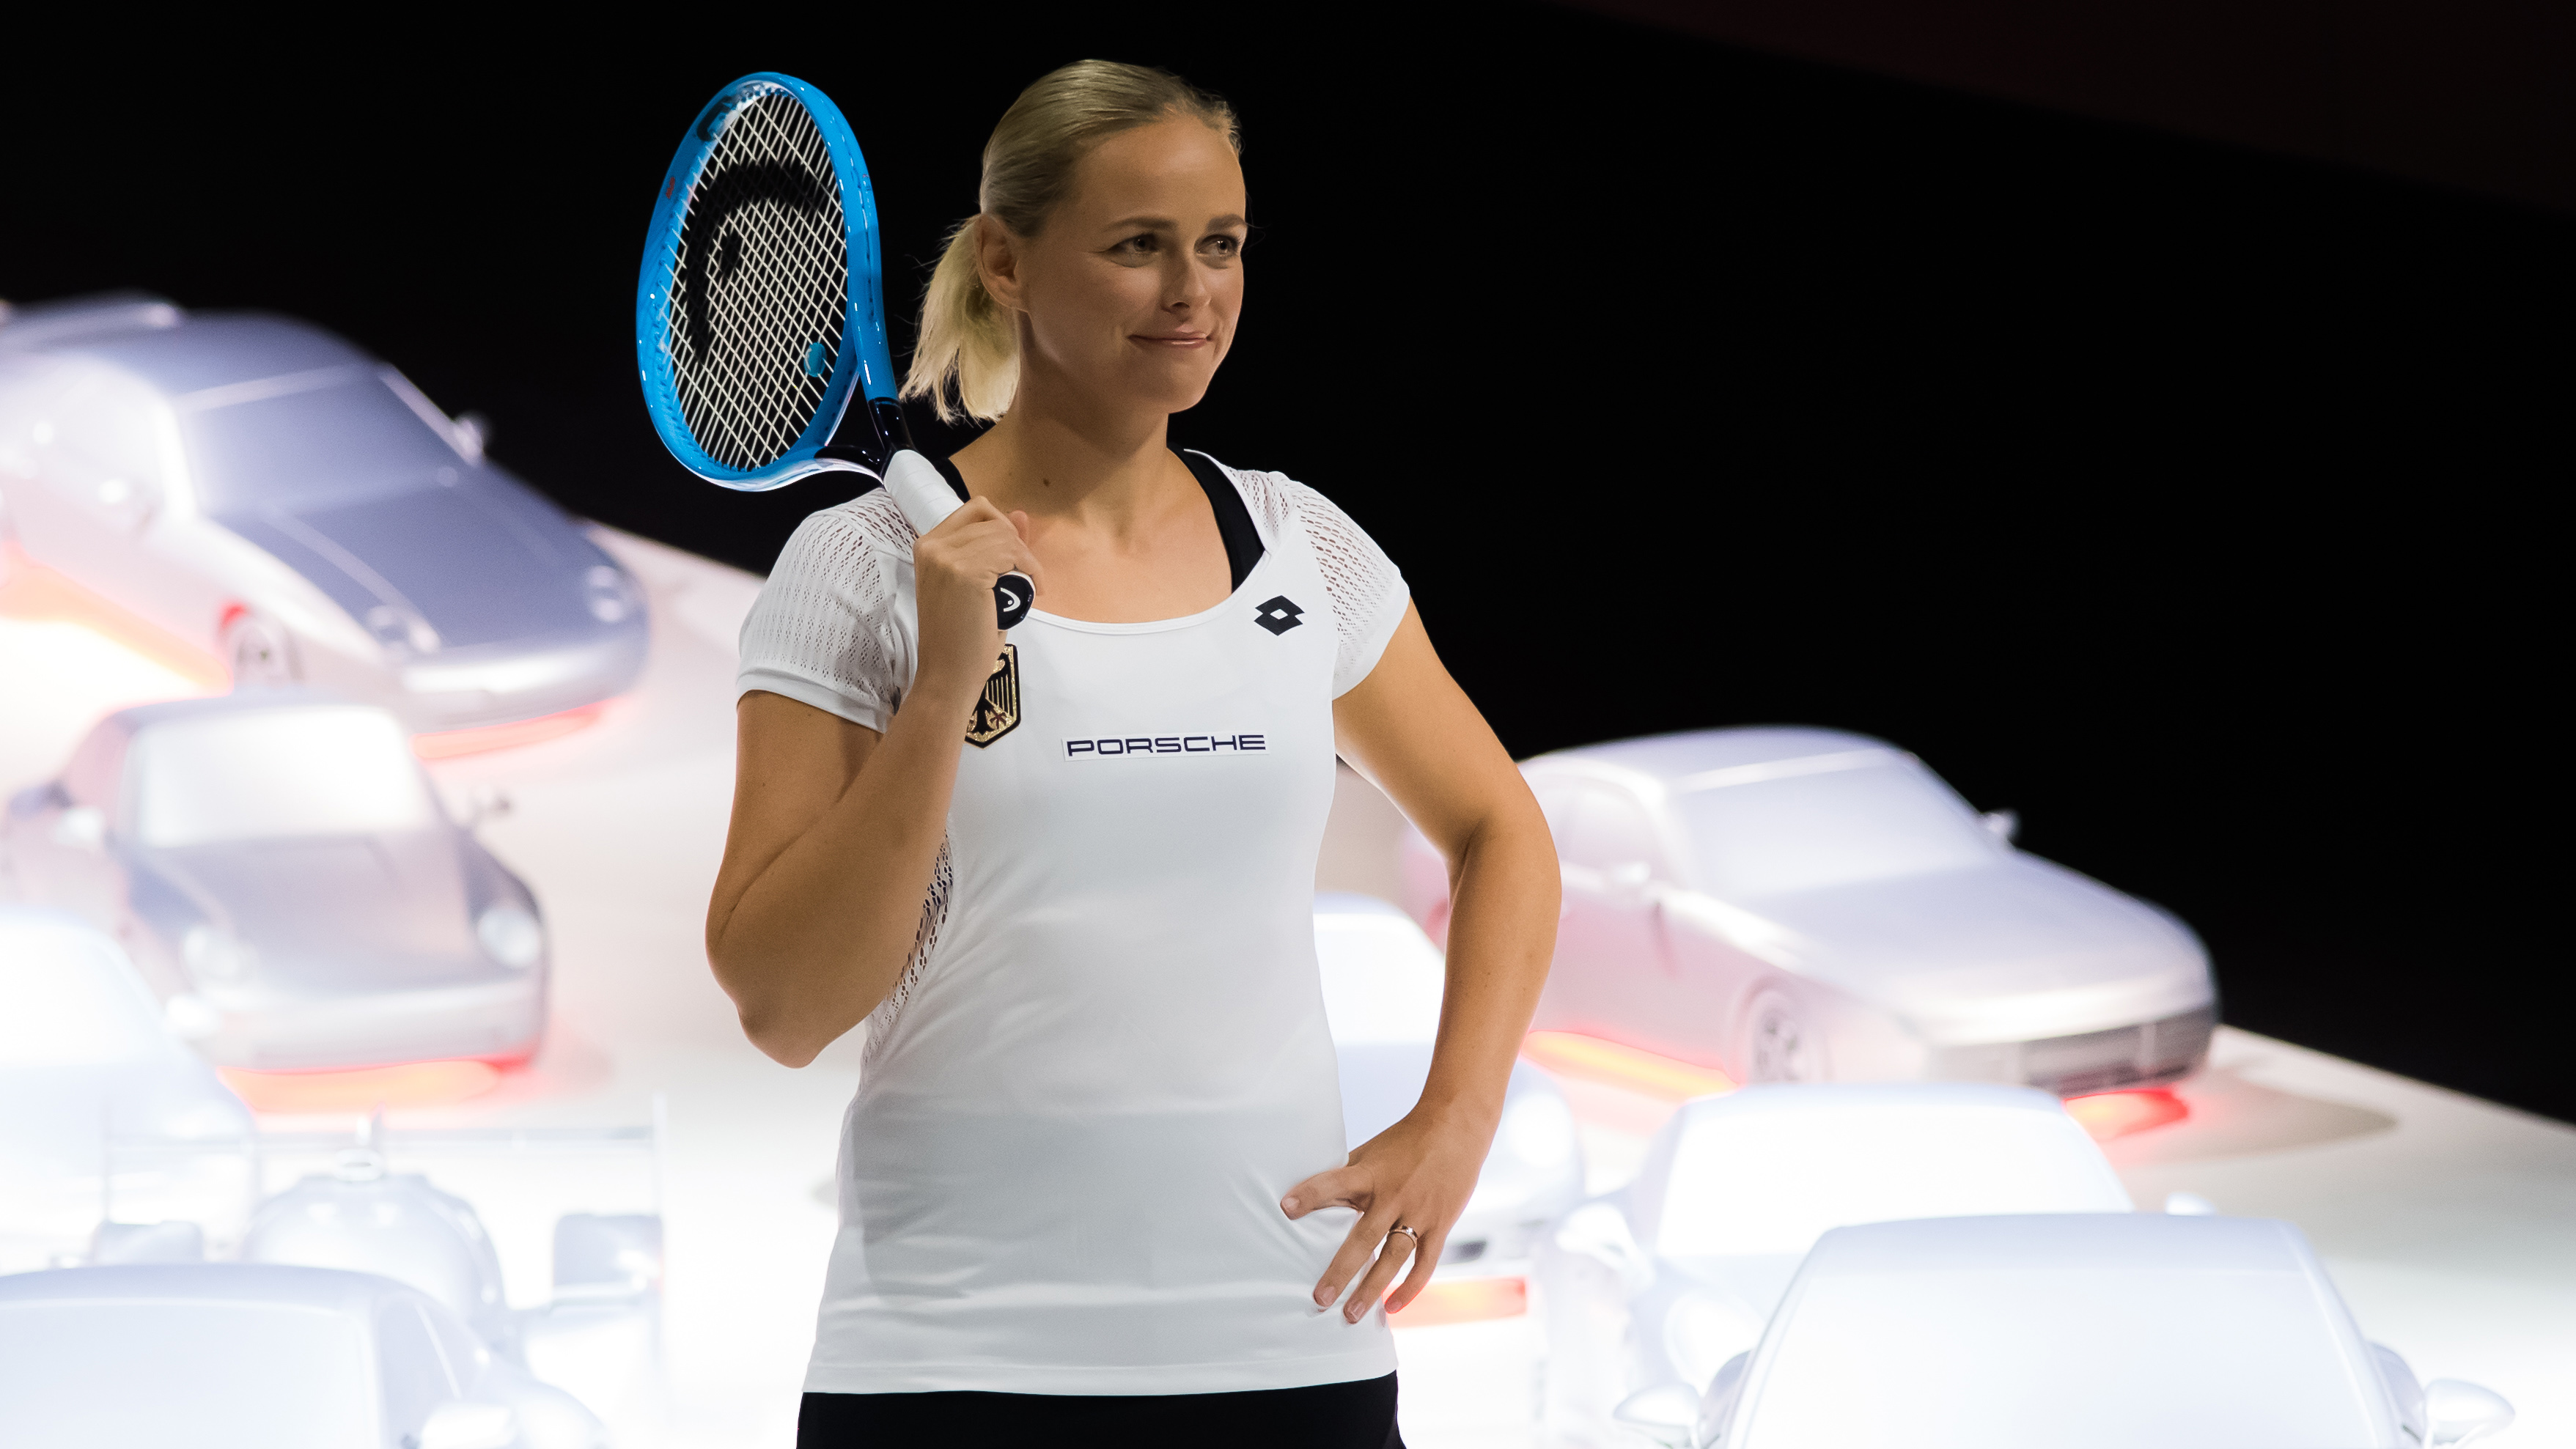 Anna-Lena Grönefeld WTA Finals